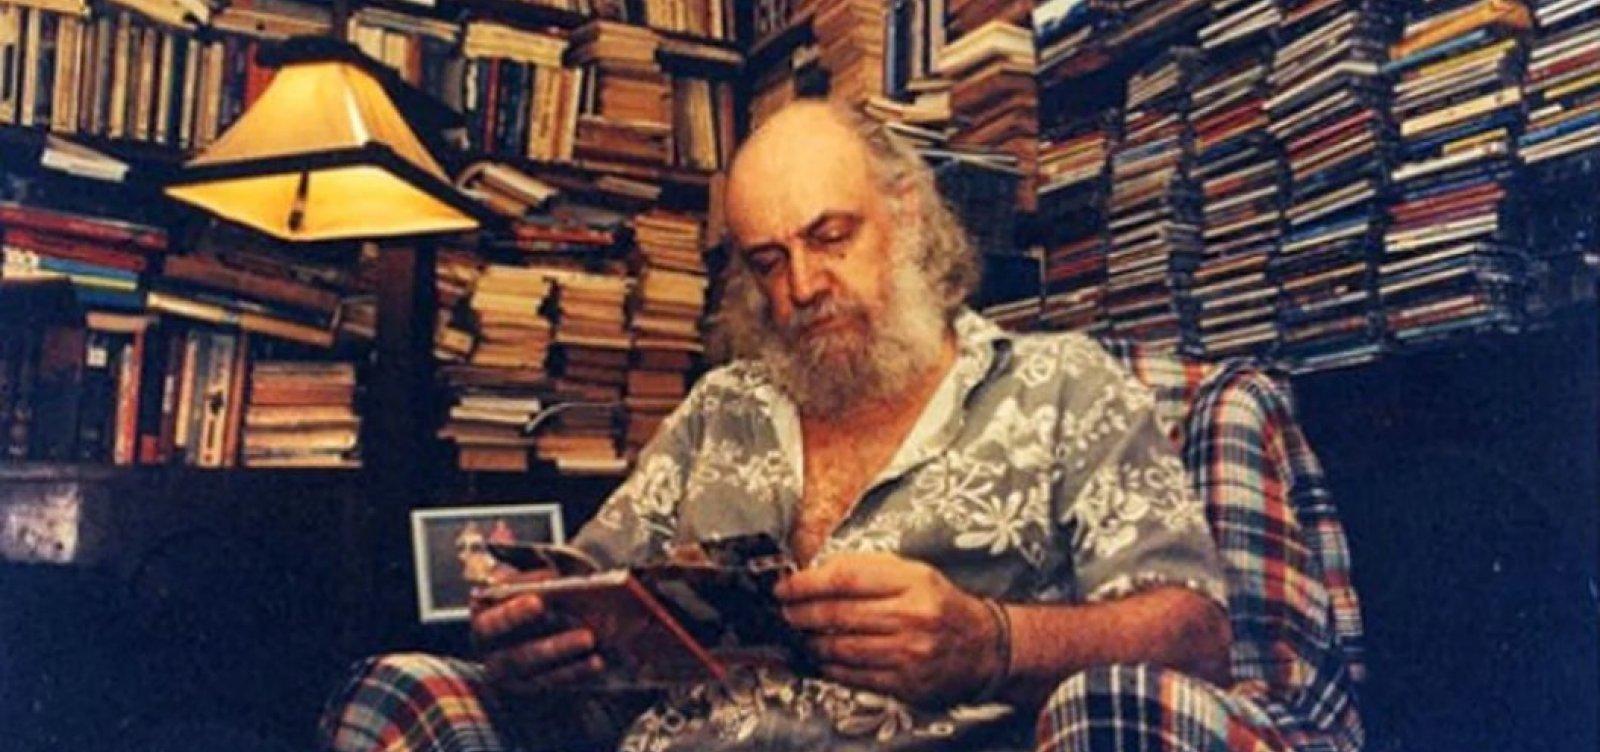 [Morre compositor e escritor Aldir Blanc, vítima de Covid-19]